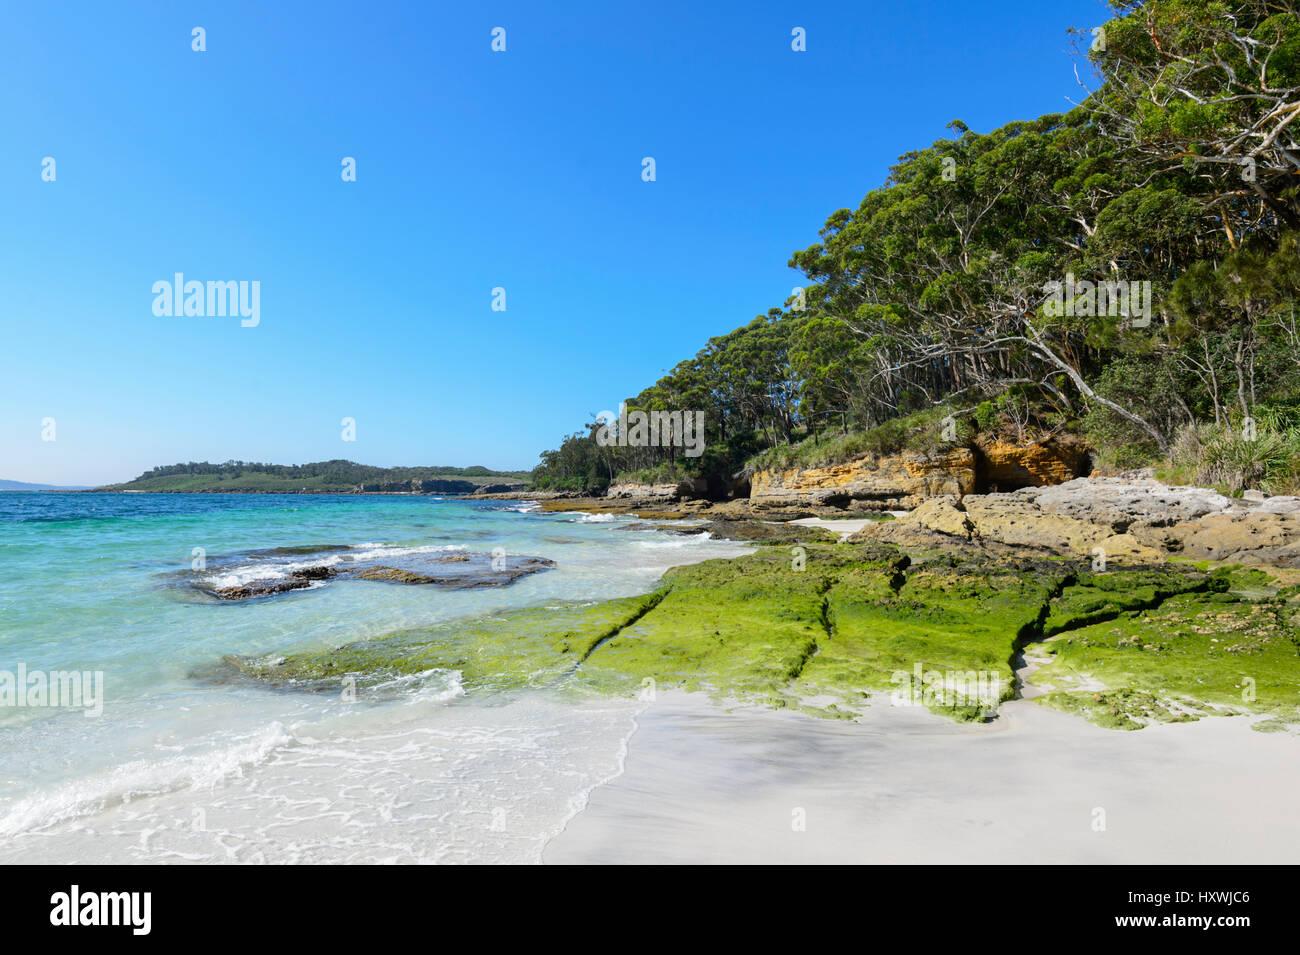 Südende des Murrays Beach, Booderee Nationalpark, Jervis Bay, New South Wales, NSW, Australien Stockbild